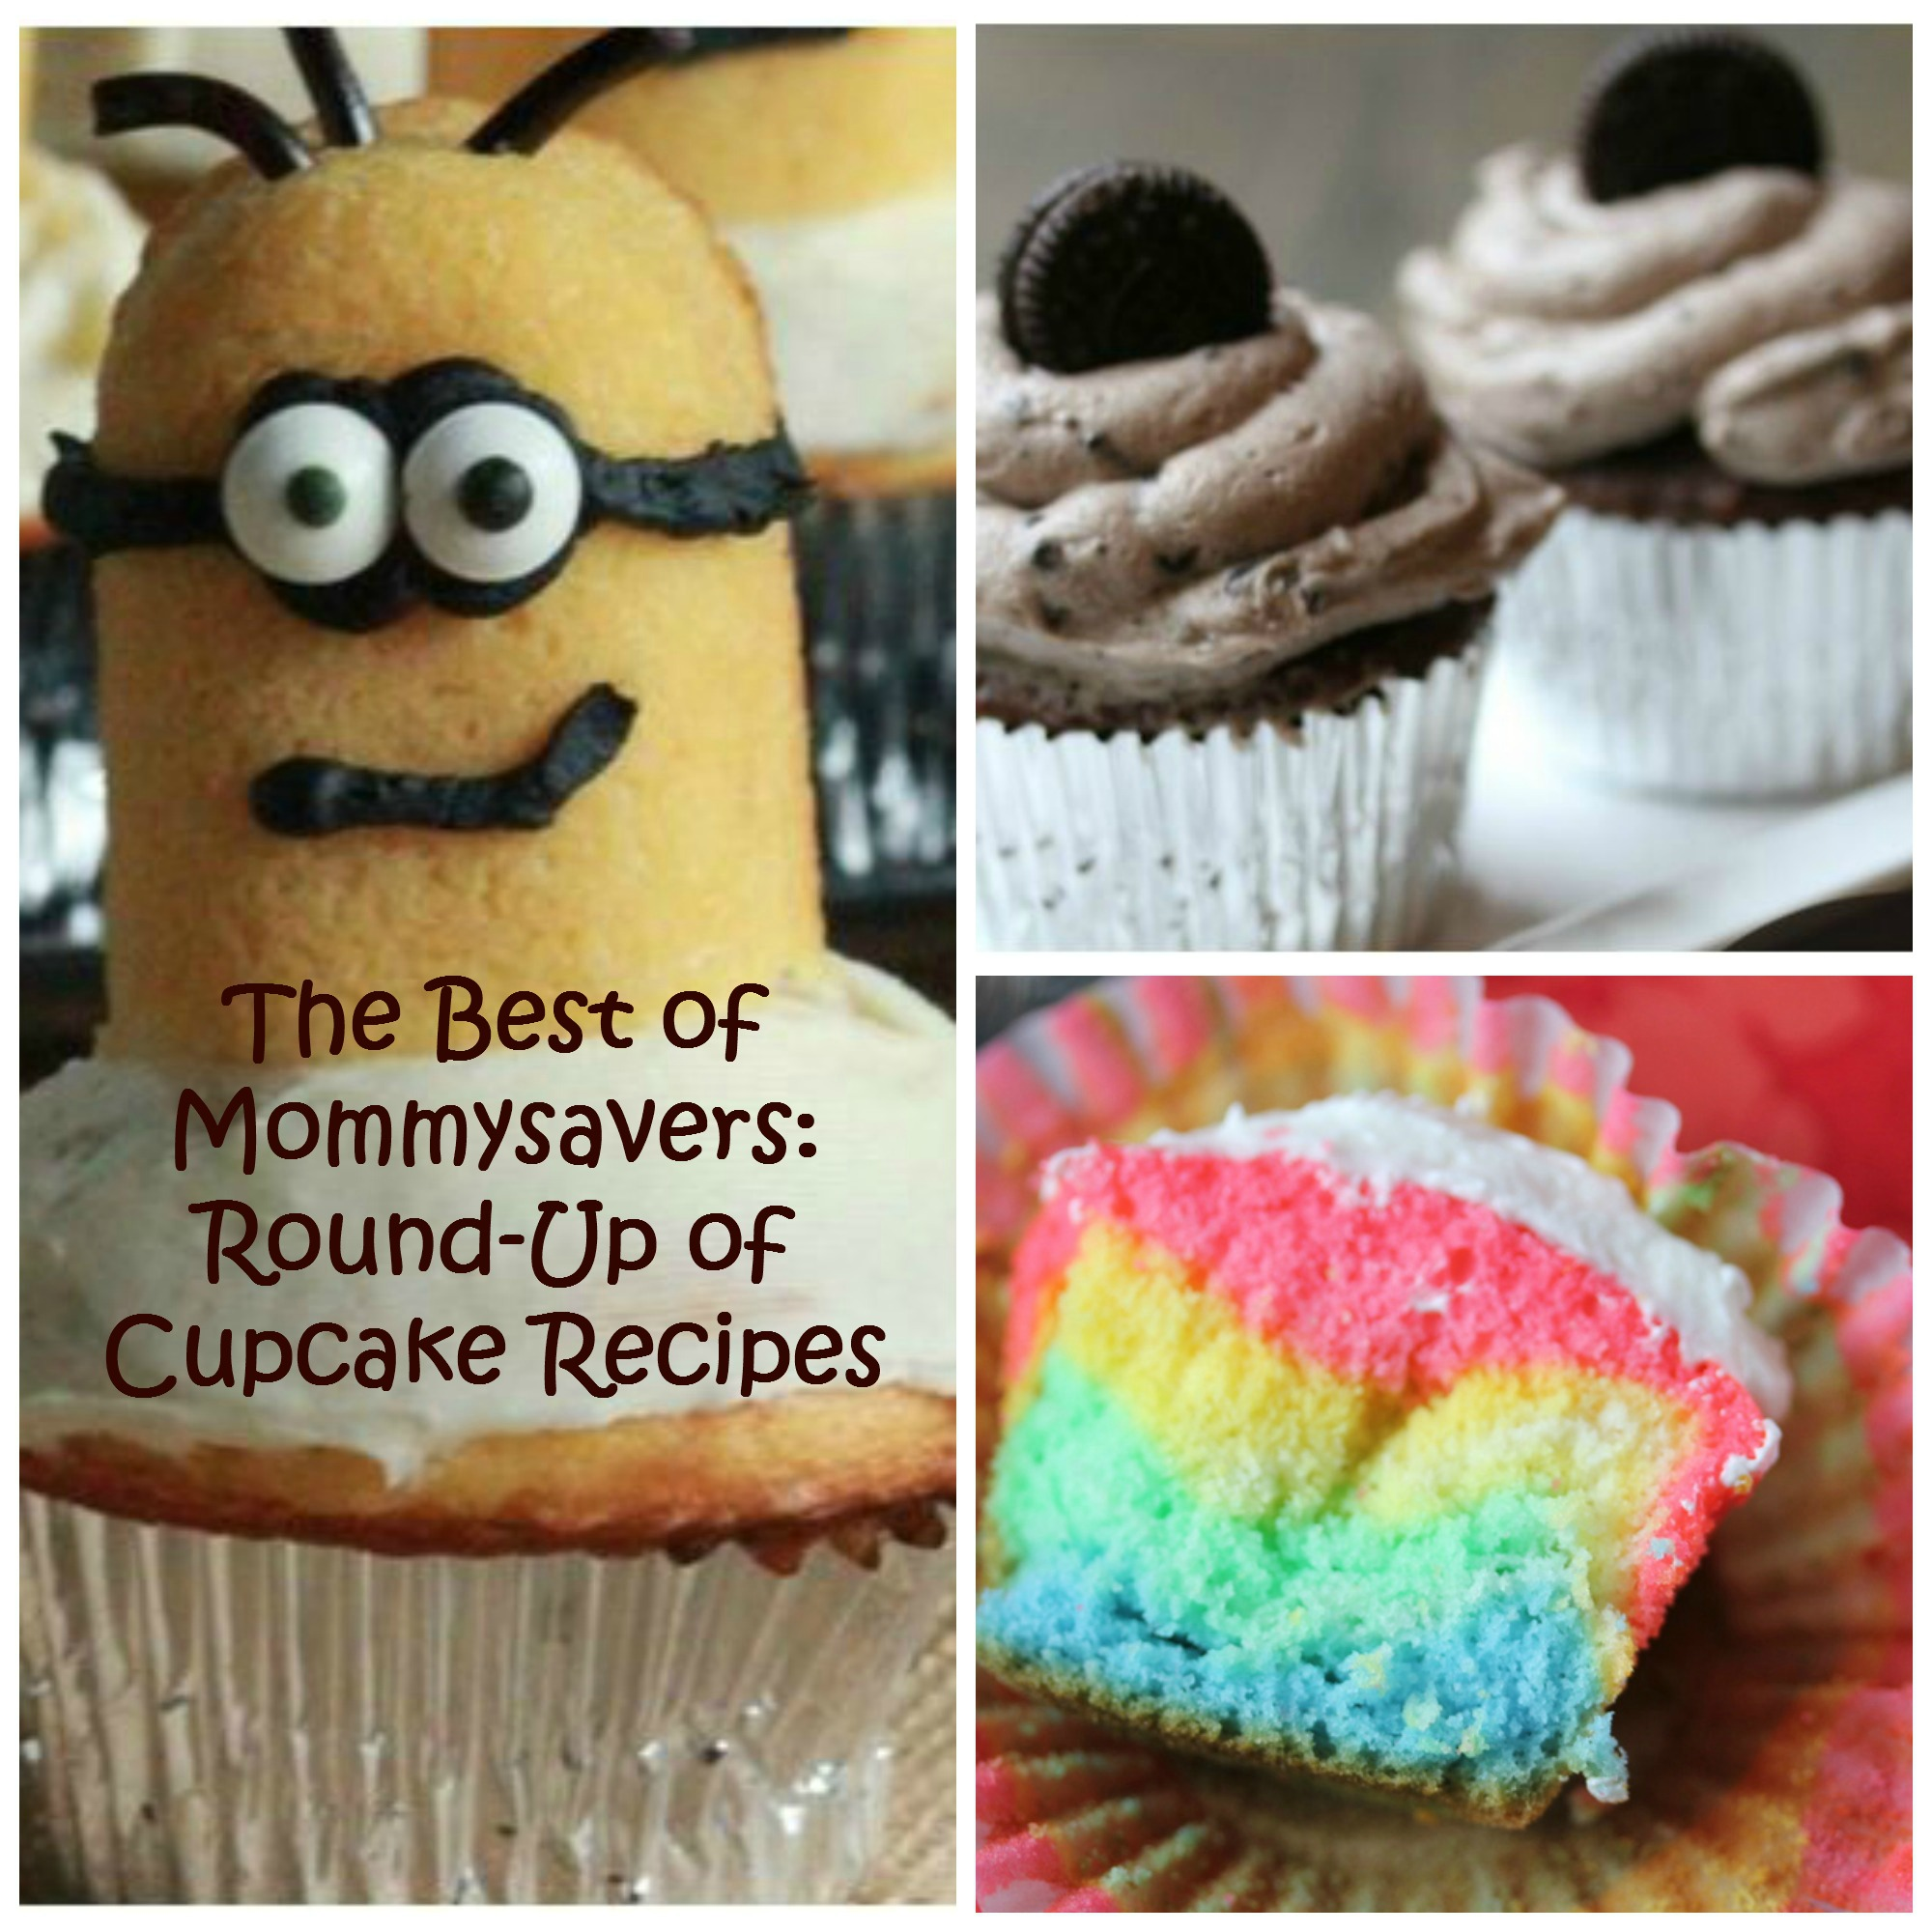 Cupcake Recipe Round-Up